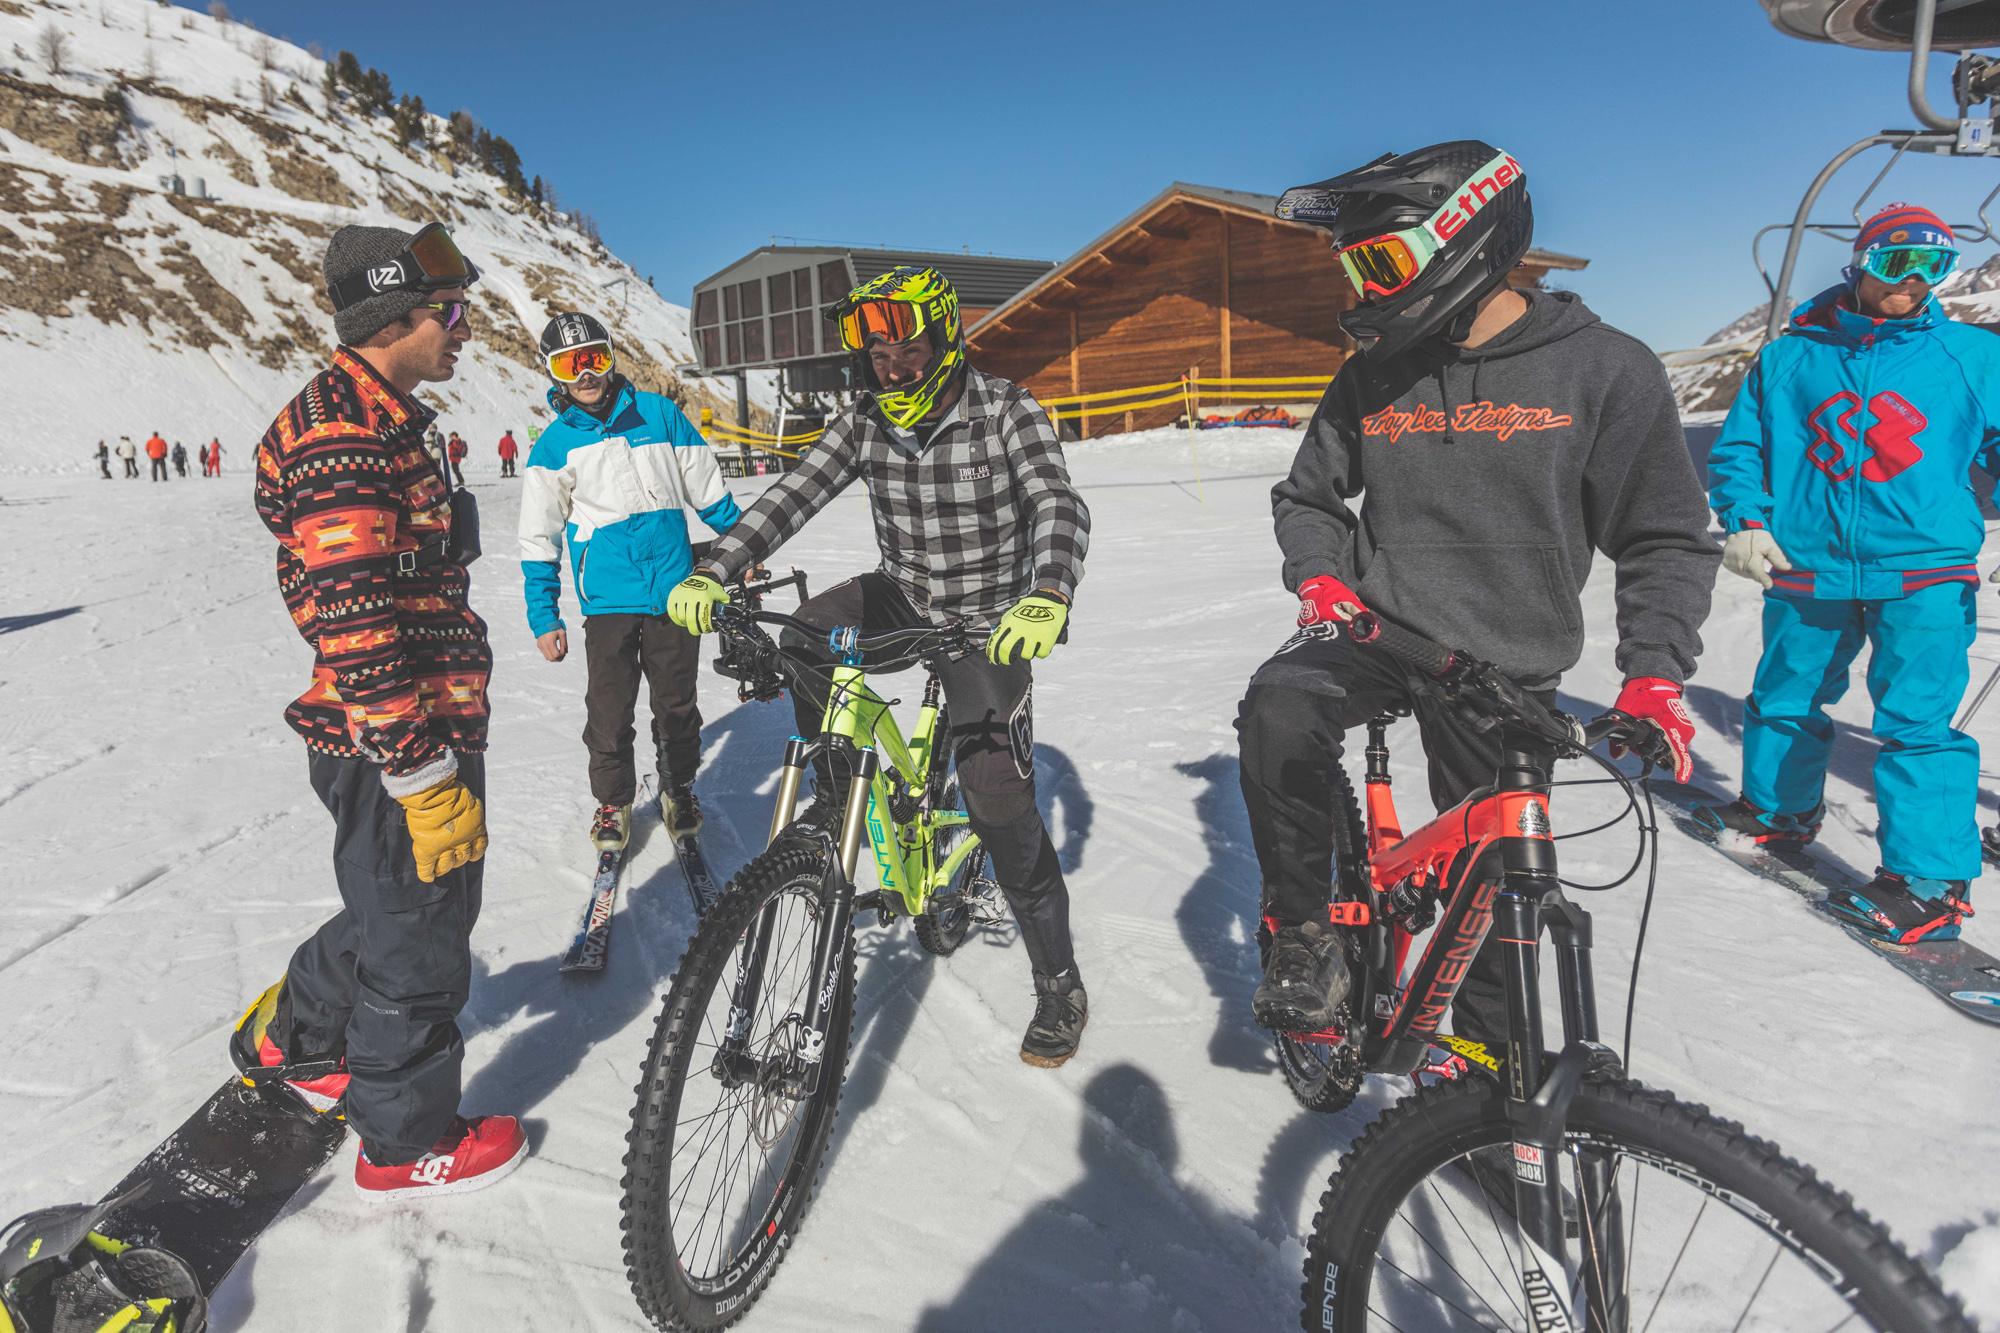 snowbike isola 2000 south crew 4B9A1038